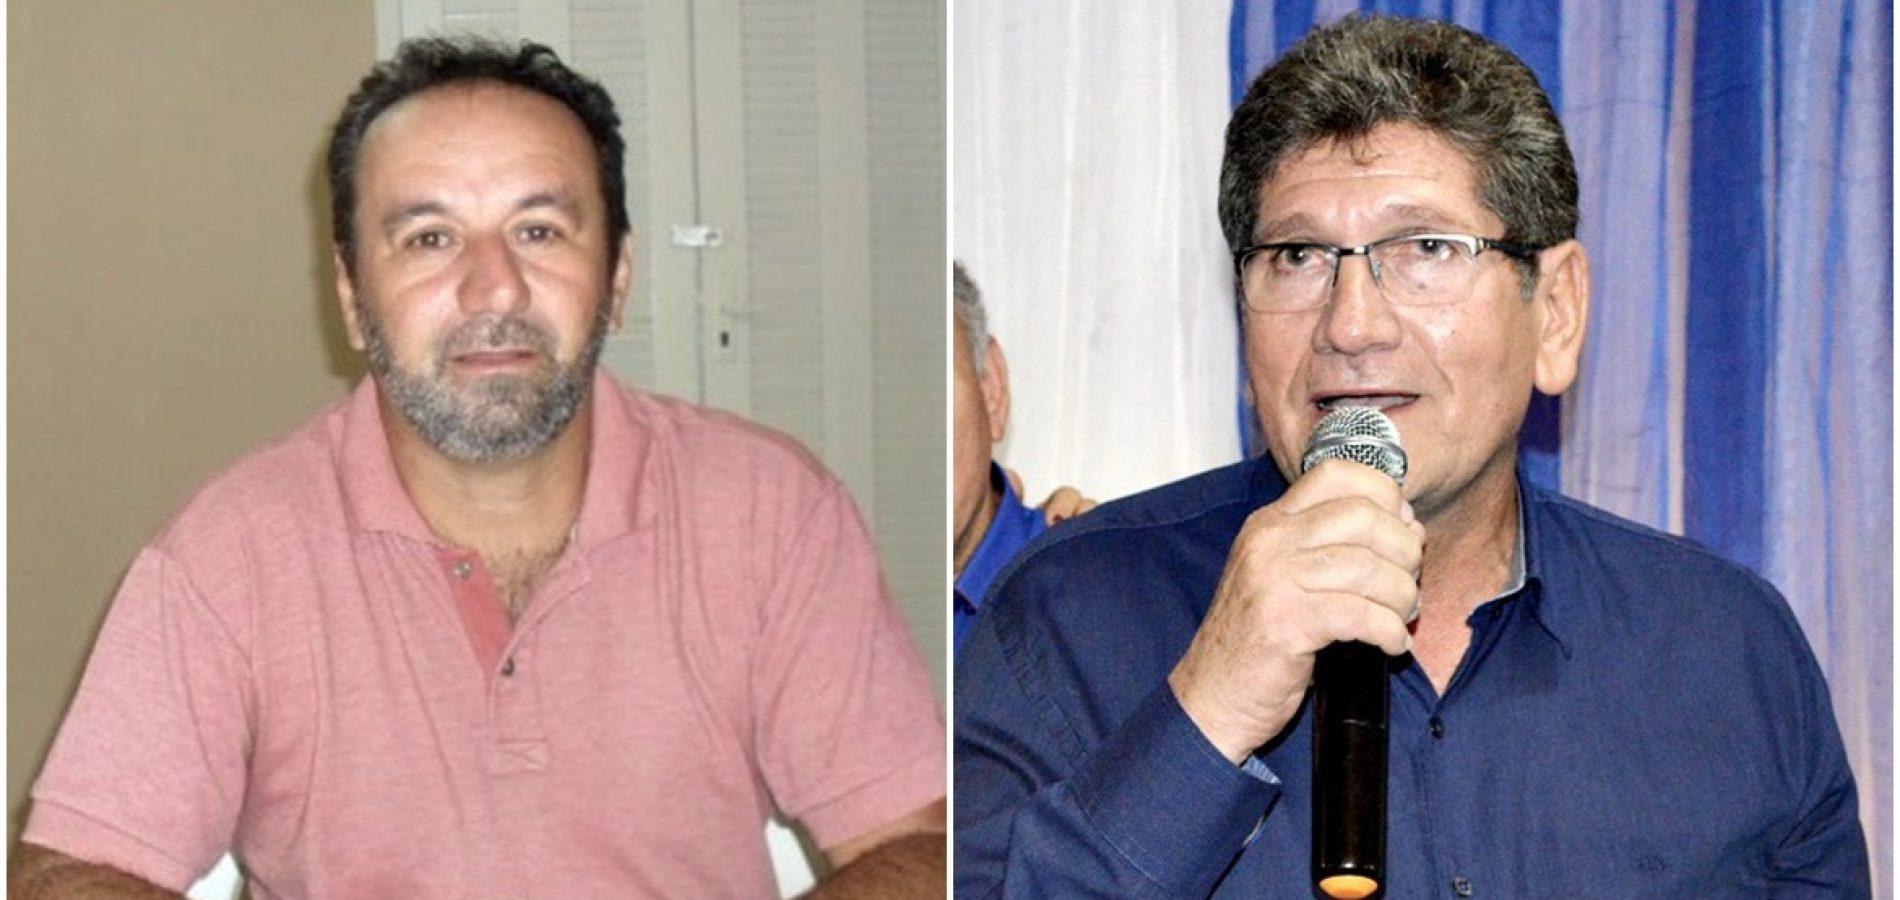 Photo of Prefeito eleito denuncia o atual prefeito de Alagoinha do Piauí e pede o bloqueio das contas